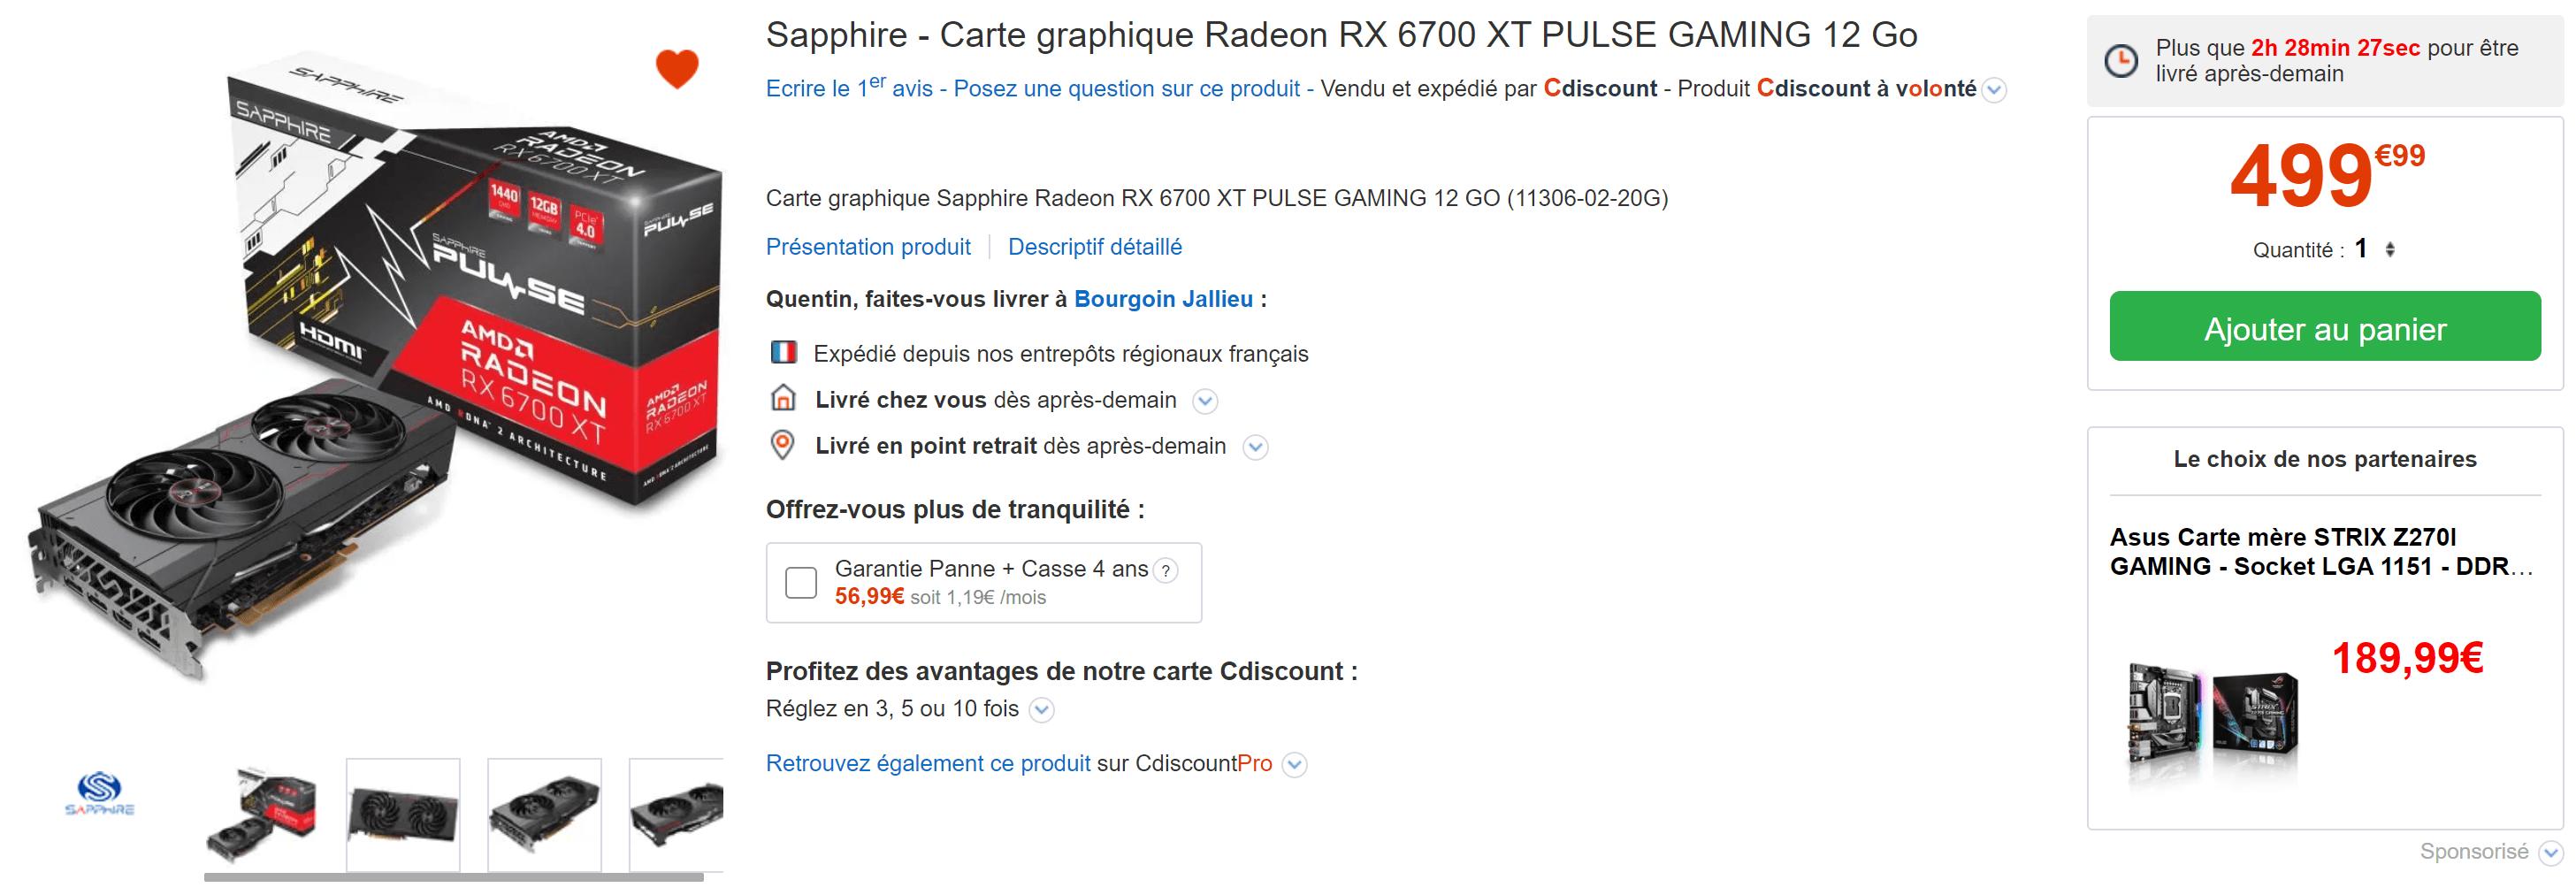 Sapphire Carte Graphique Radeon Rx 6700 Xt Pulse Gaming En Stock